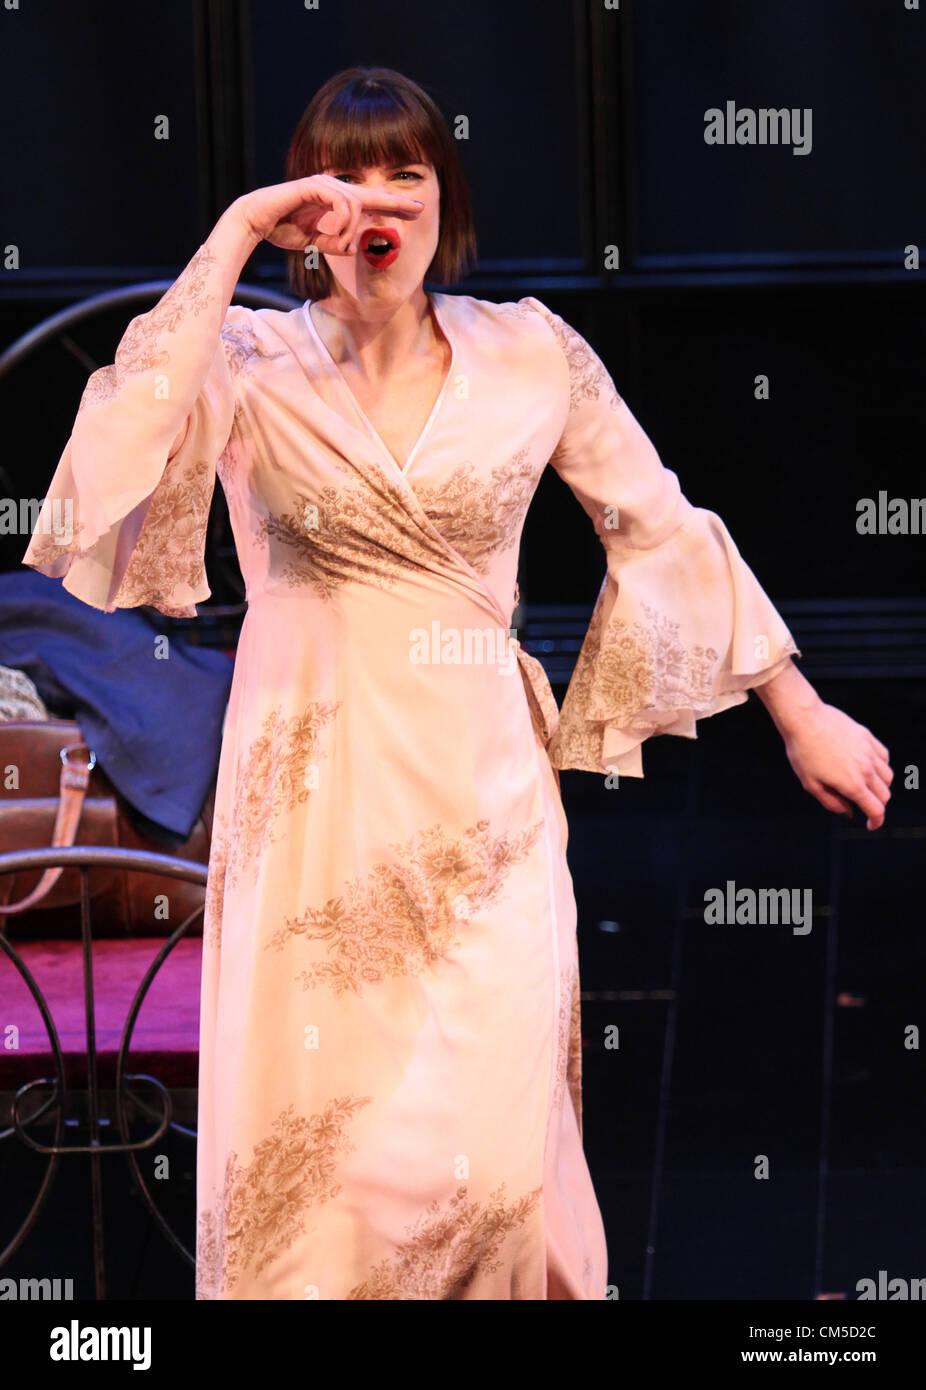 MICHELLE RYAN CABARET. PHOTOCALL Londres Angleterre Royaume-uni 08 Octobre 2012 Photo Stock